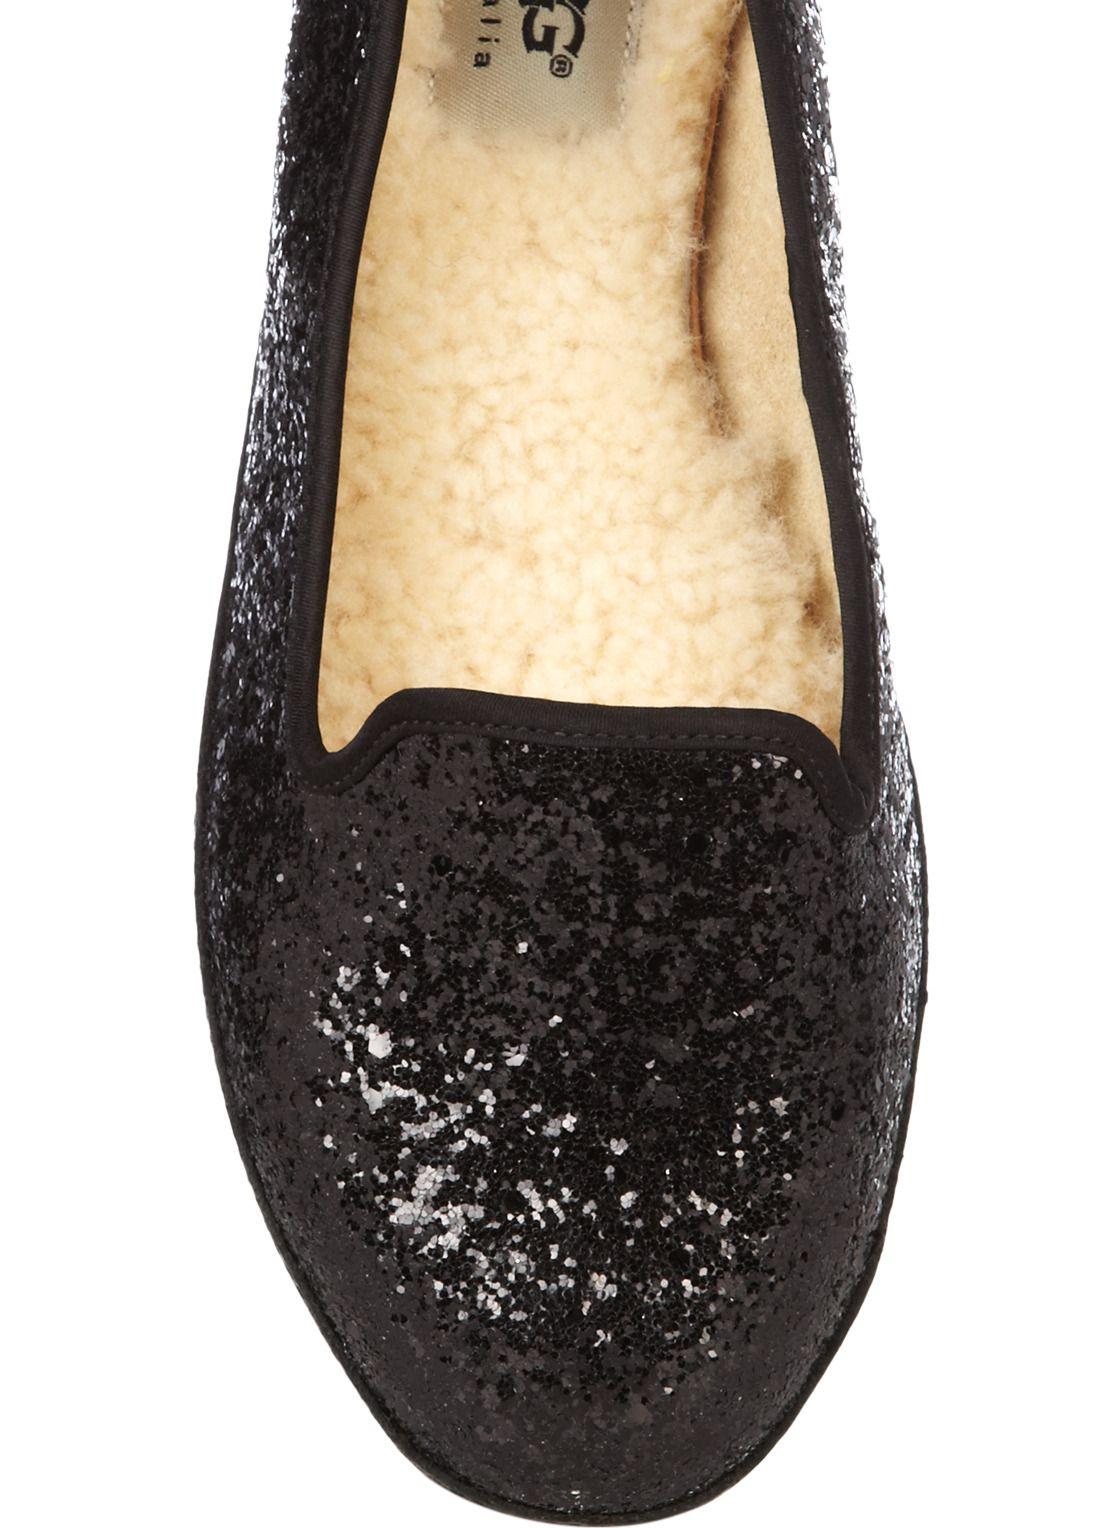 UGG Australia Loafer Alloway met glitters • de Bijenkorf > they actually look nice and comfy :D